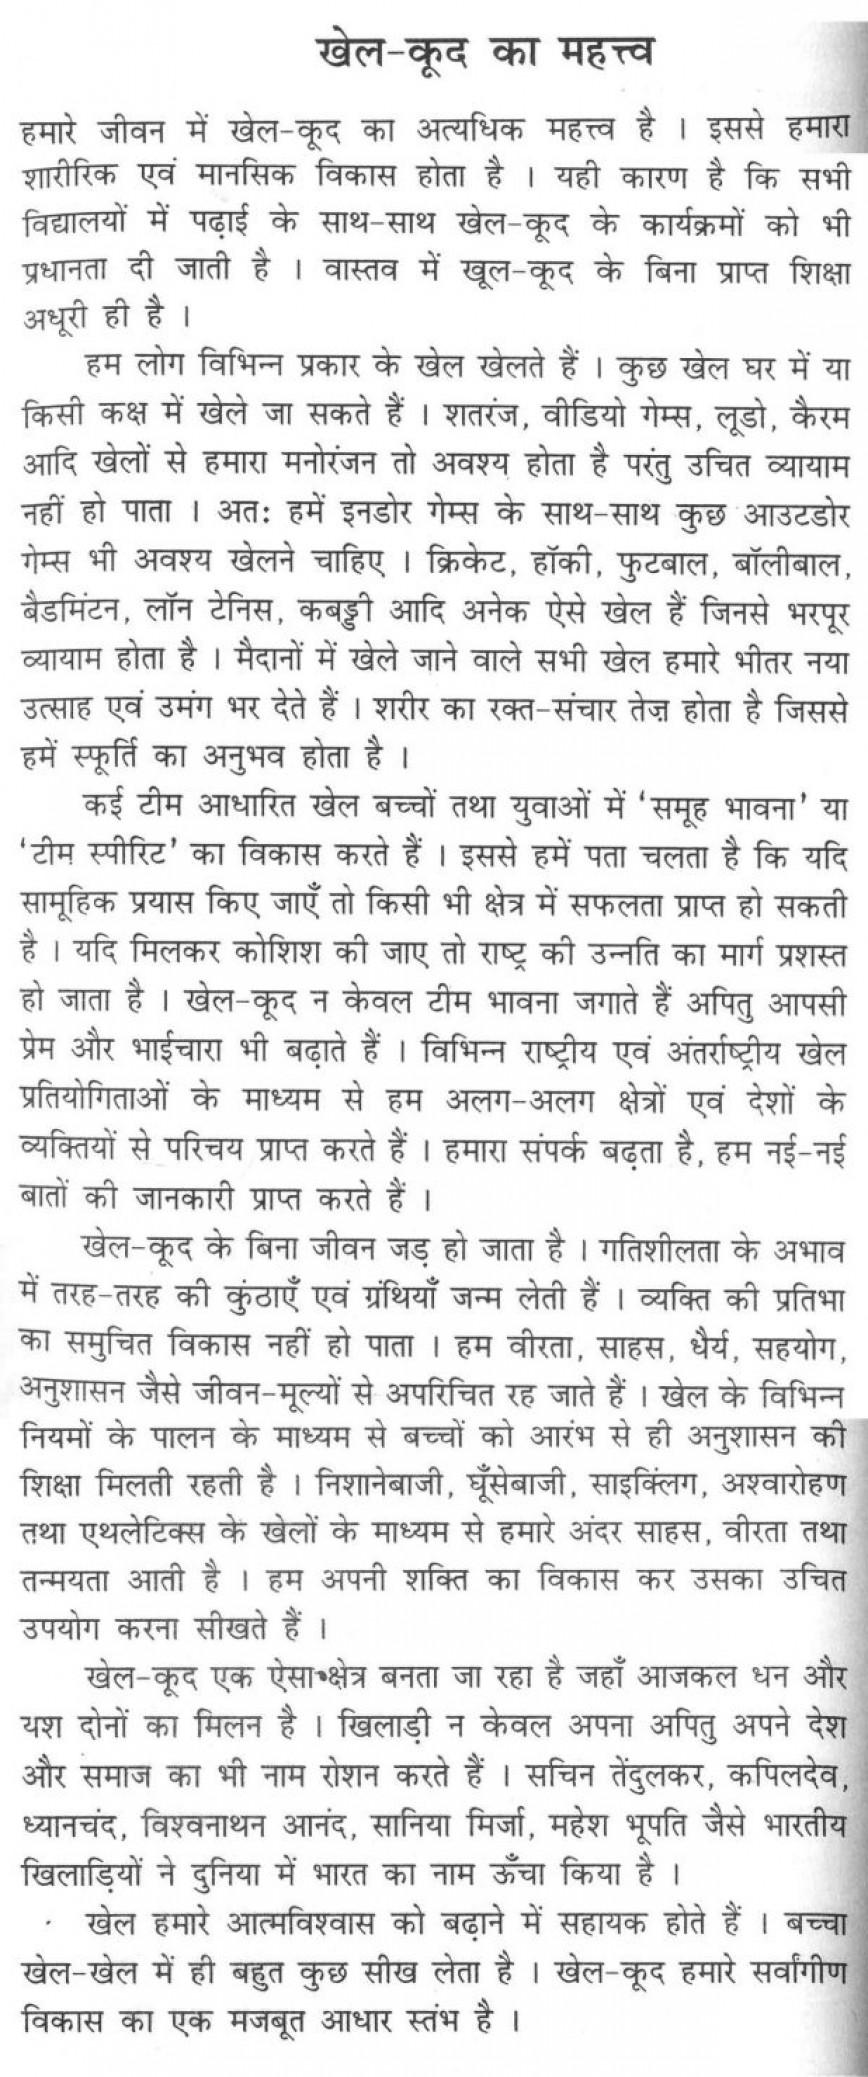 011 Essay Example The Importance Of Voting Essays Hindi Thumb What Is Pdf In Punjabi Tamil Democracy Kannada On India English And Persuasive Fearsome Marathi Telugu Language